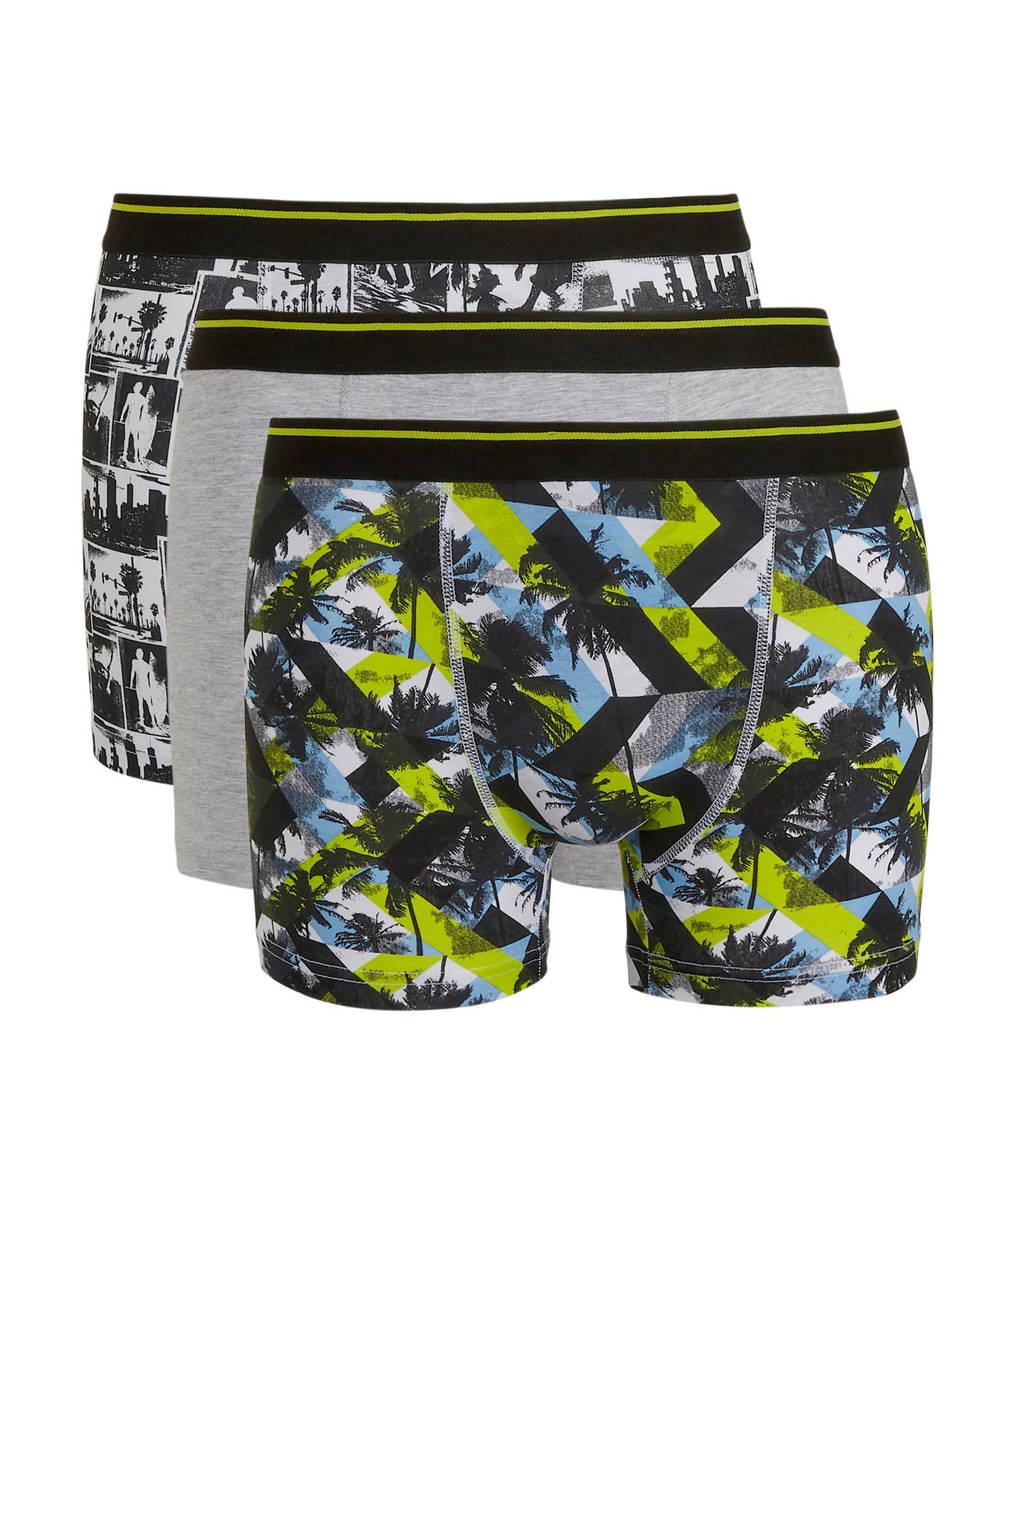 C&A Here & There   boxershort - set van 3 multicolor, Multicolor